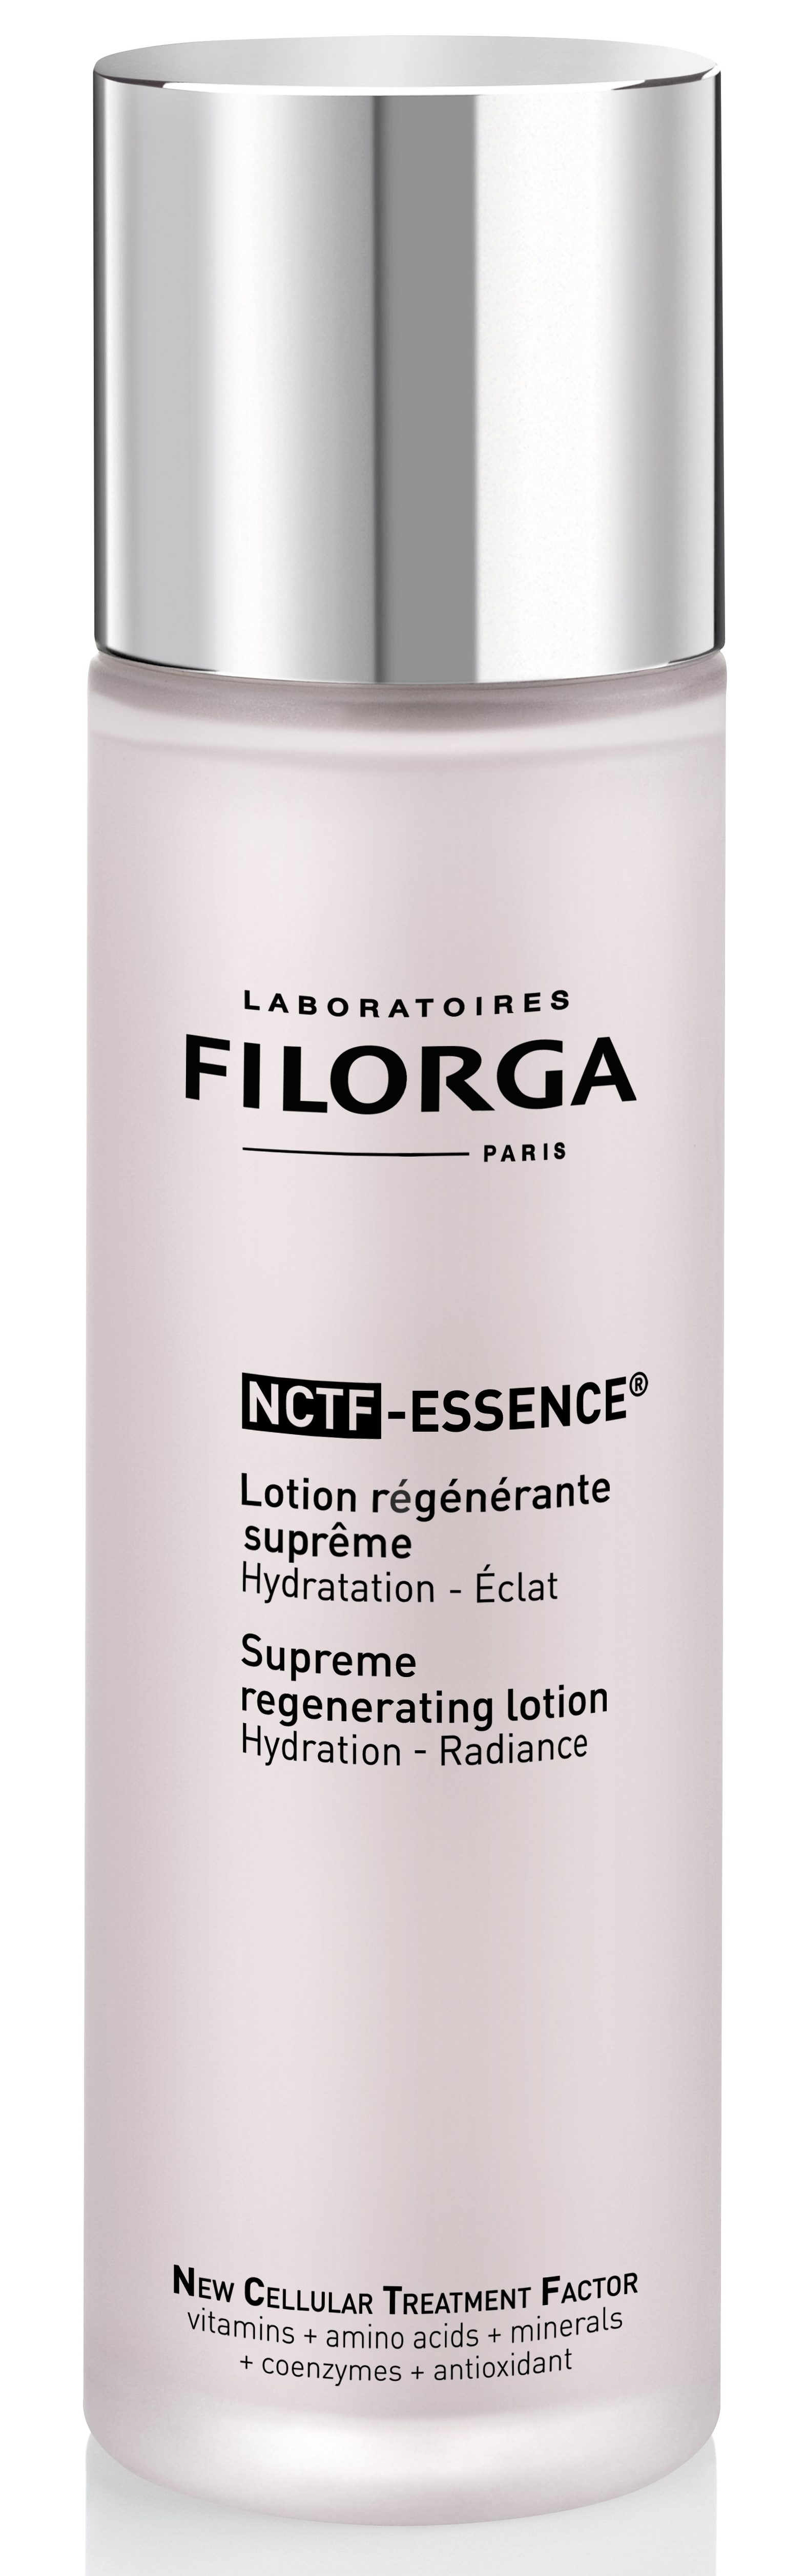 NCTF-ESSENCE Filorga serum primer